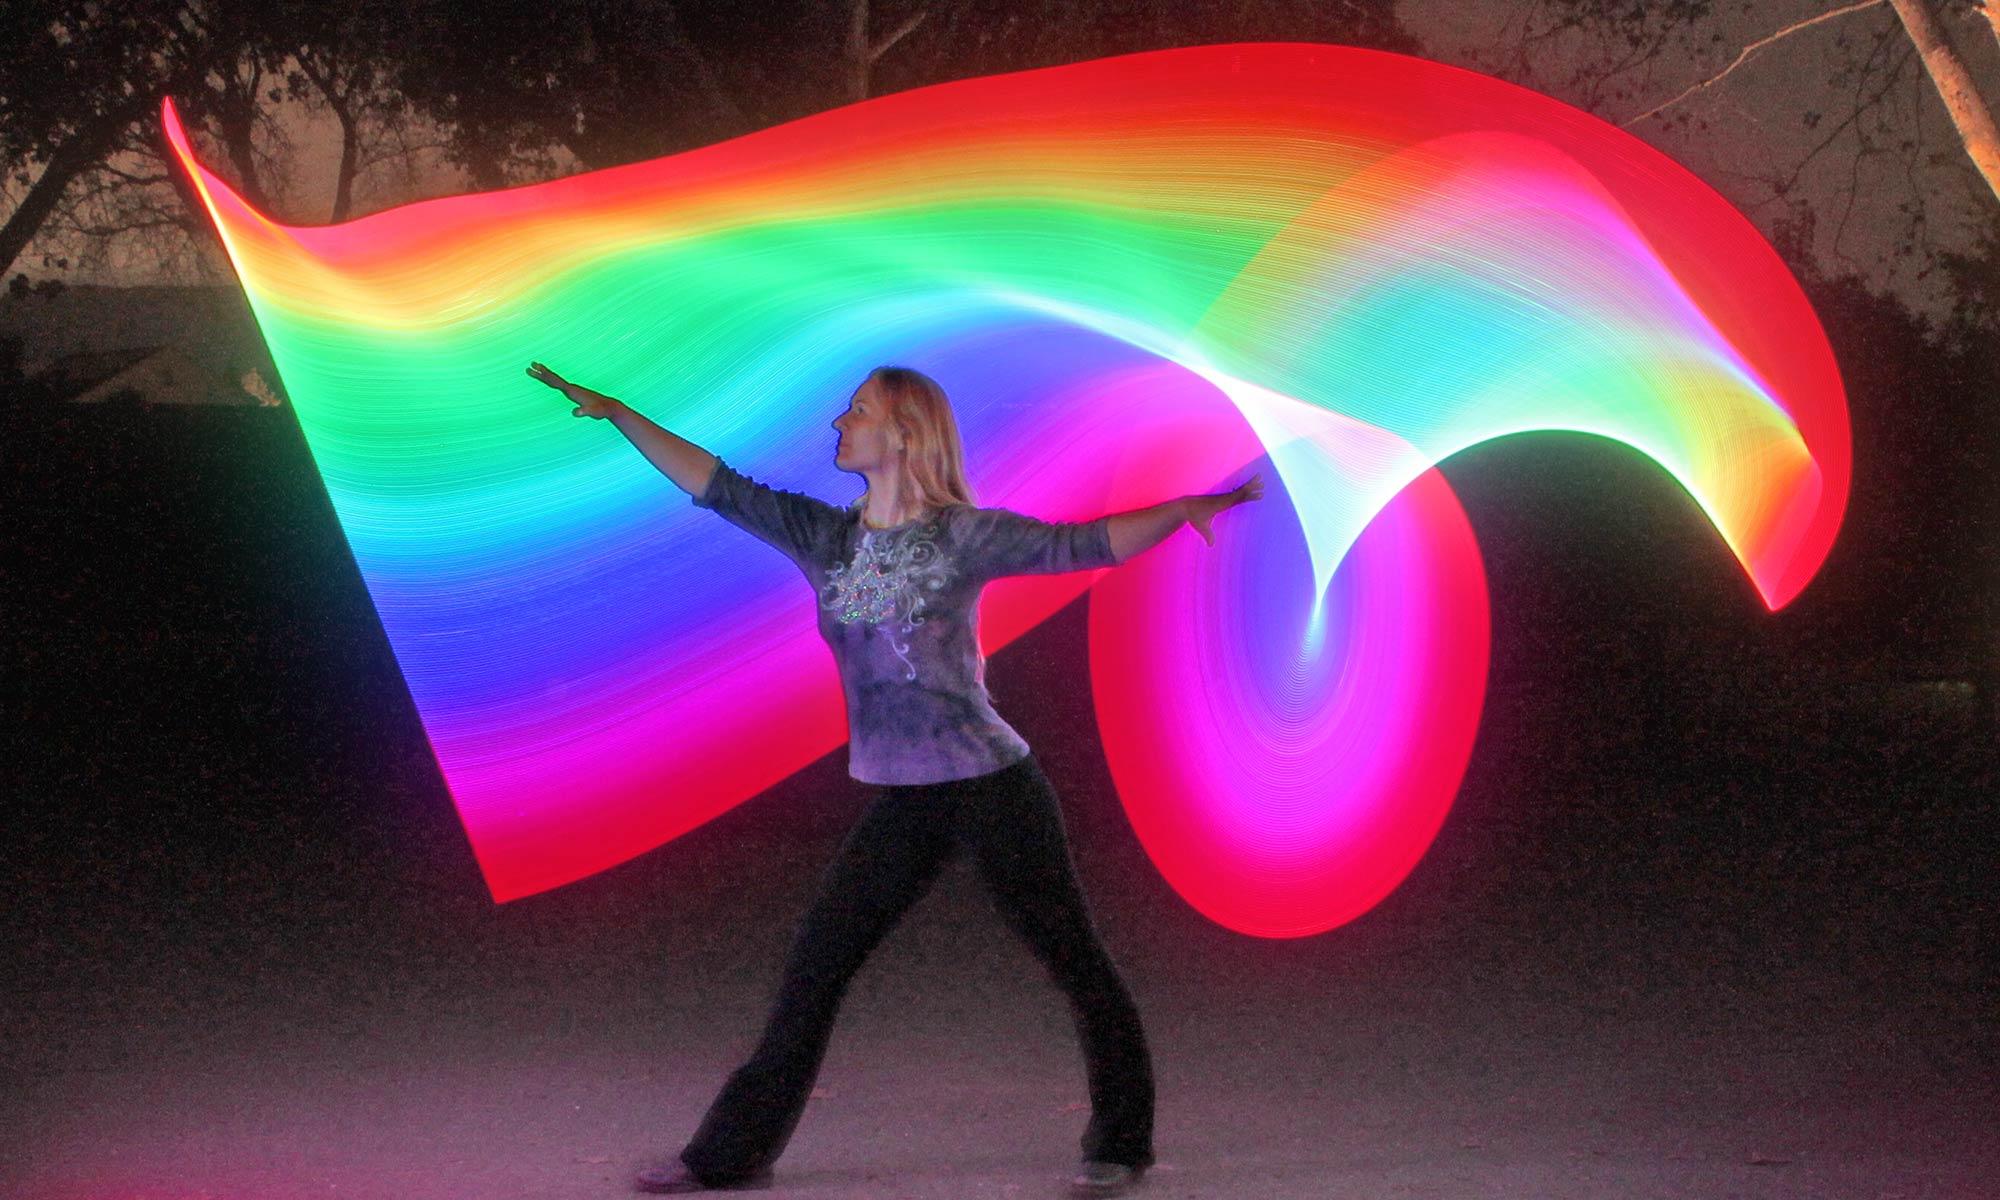 raspberry_pi_rainbow4.jpg